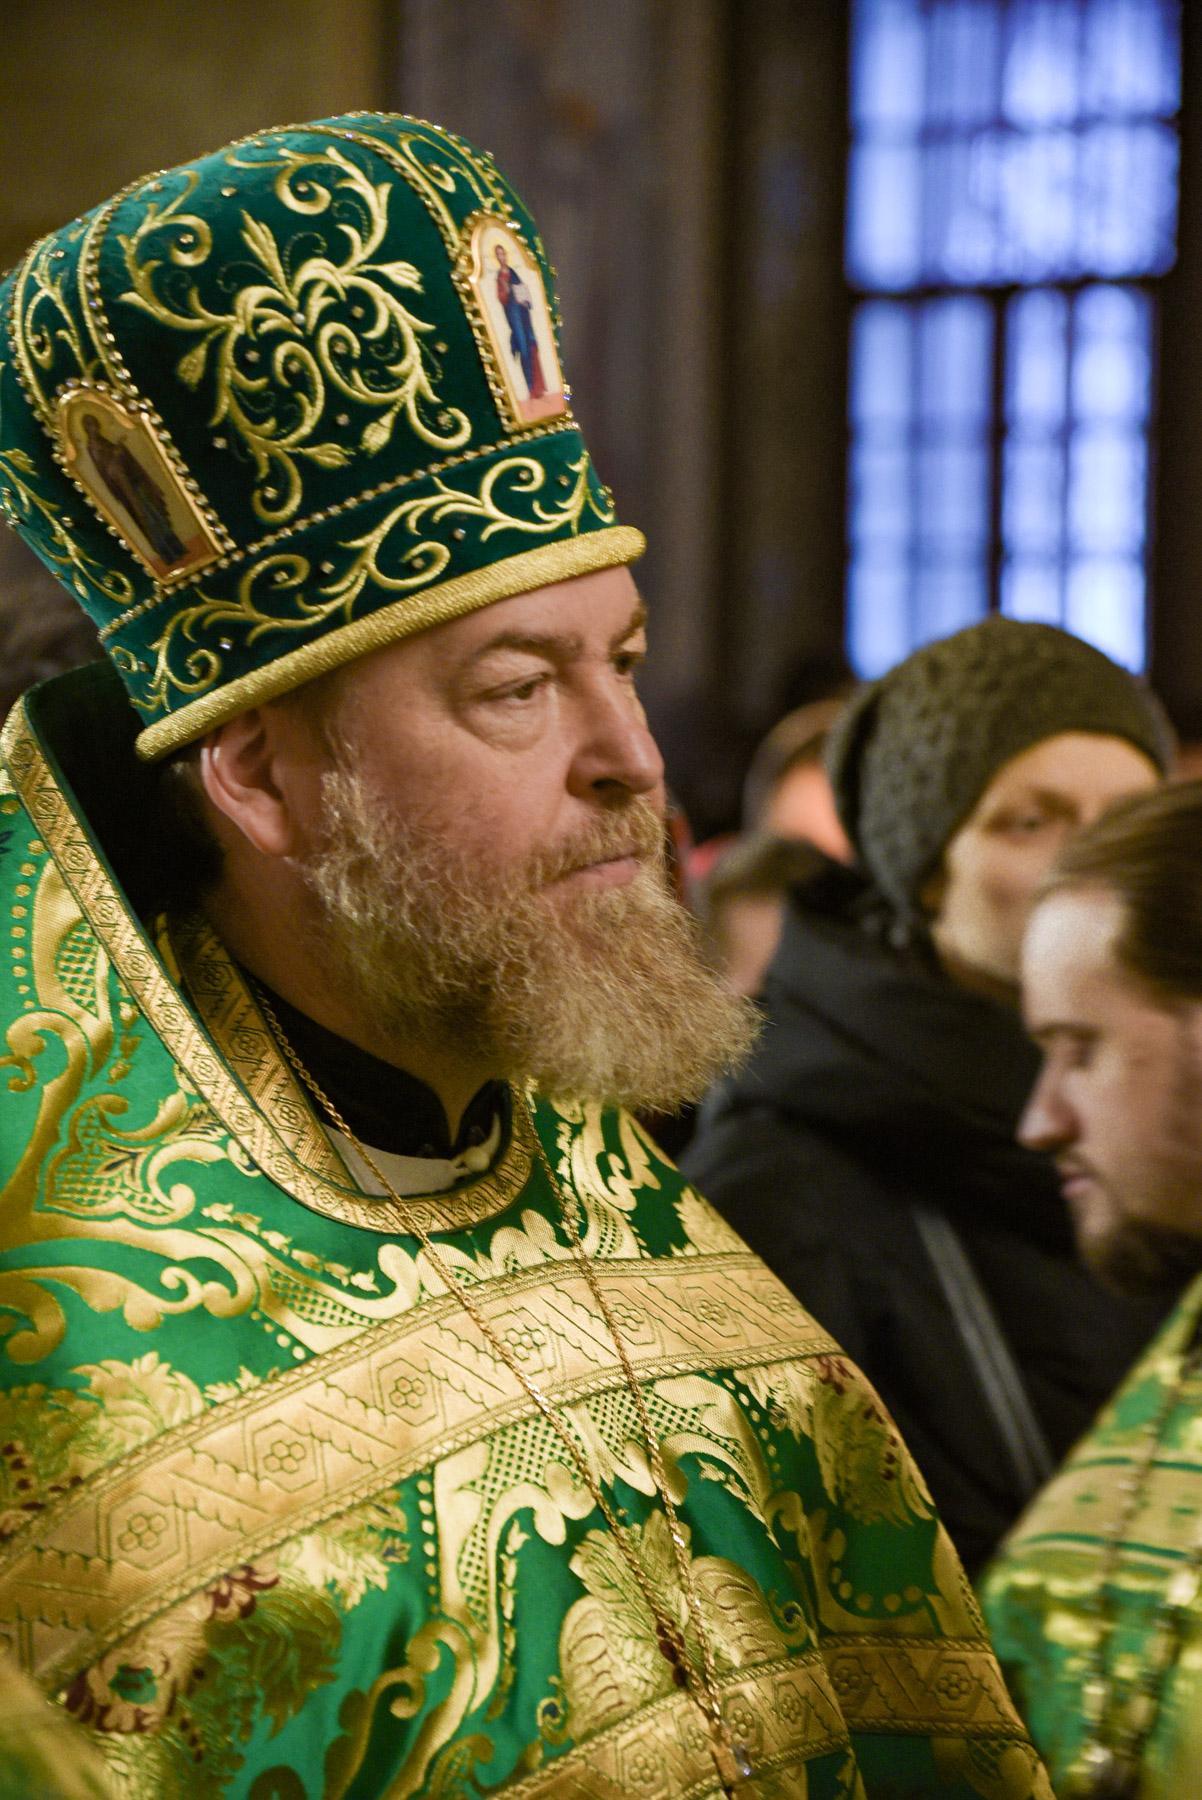 photos of orthodox christmas 0090 2